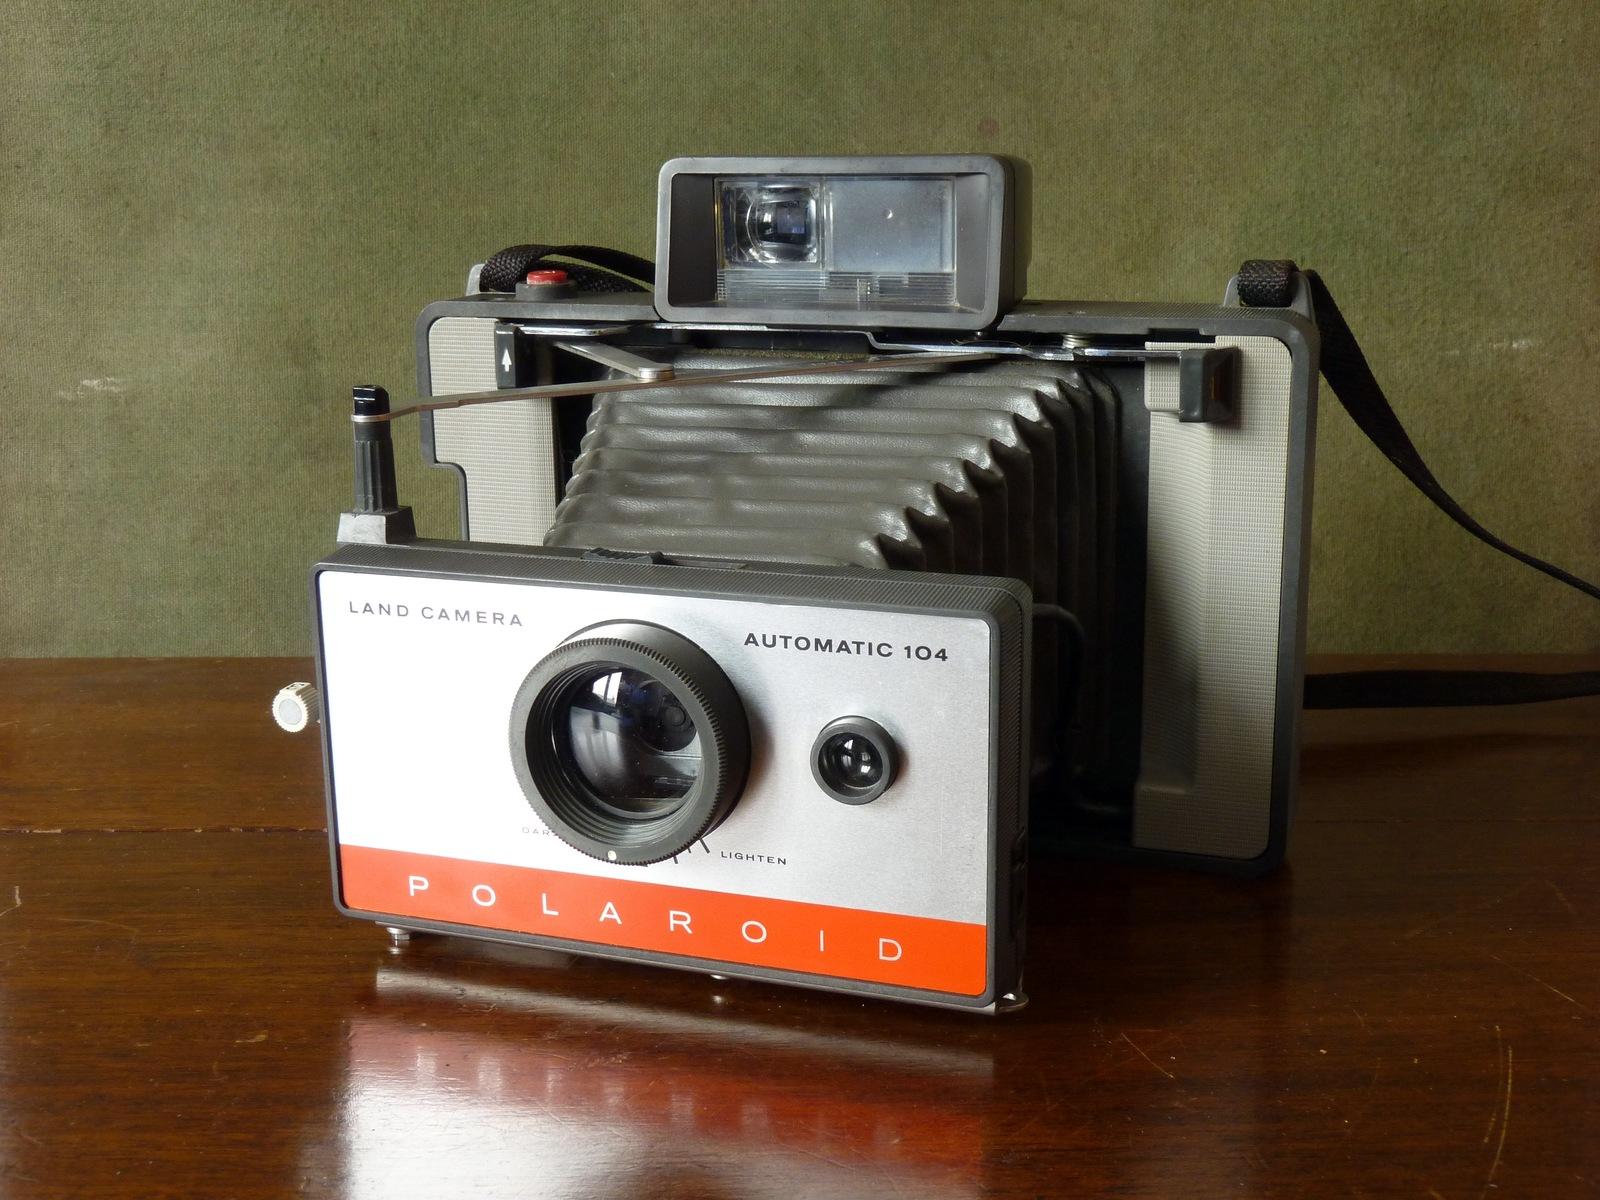 Polaroid Land Camera Automatic 104 (1965)